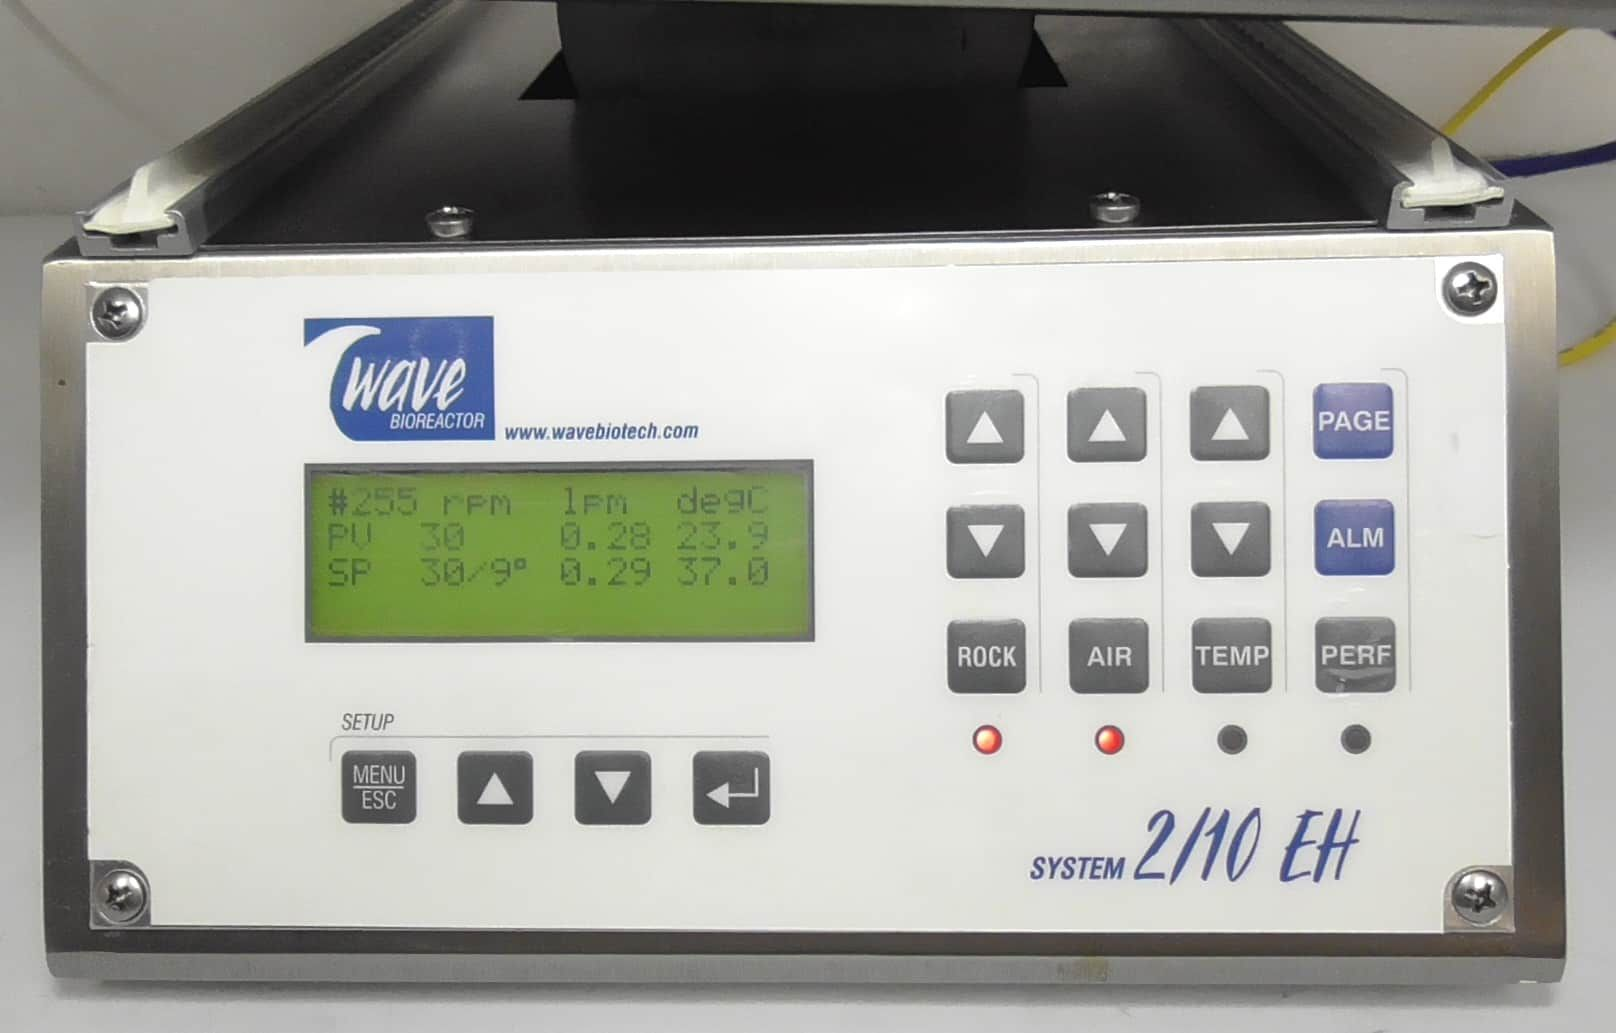 Wave Biotech 2/10 EH (Model Base2EH) Bioreactor